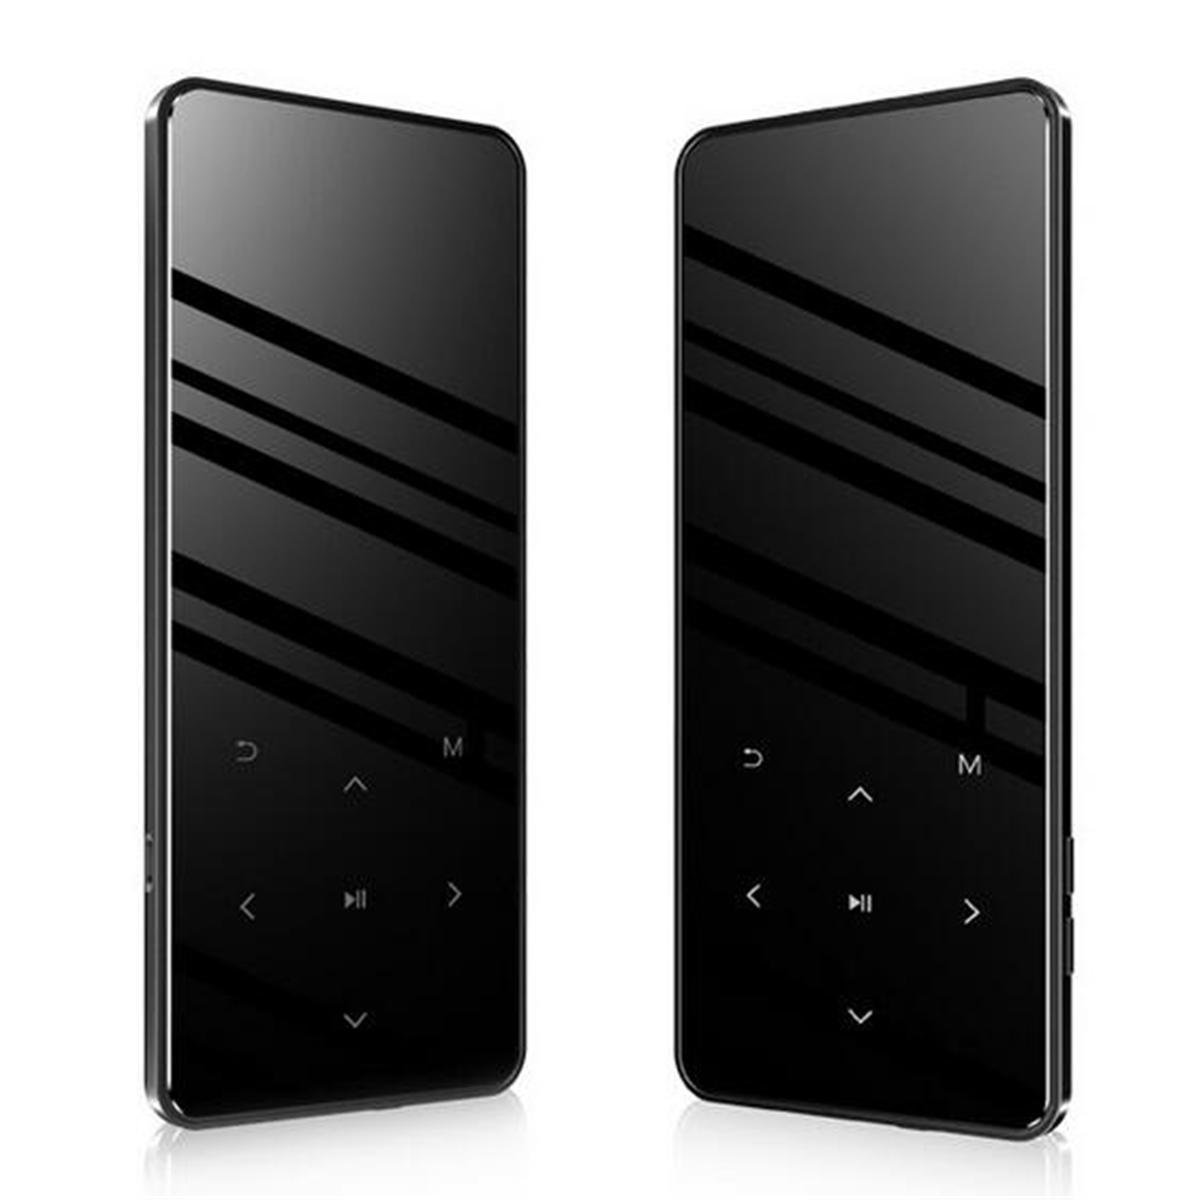 Uniscom X12 2.4 Pollici 8GB Lossless Bluetooth Lettore MP3 2.5D Touch Screen FM Radio Lettore musicale MP4